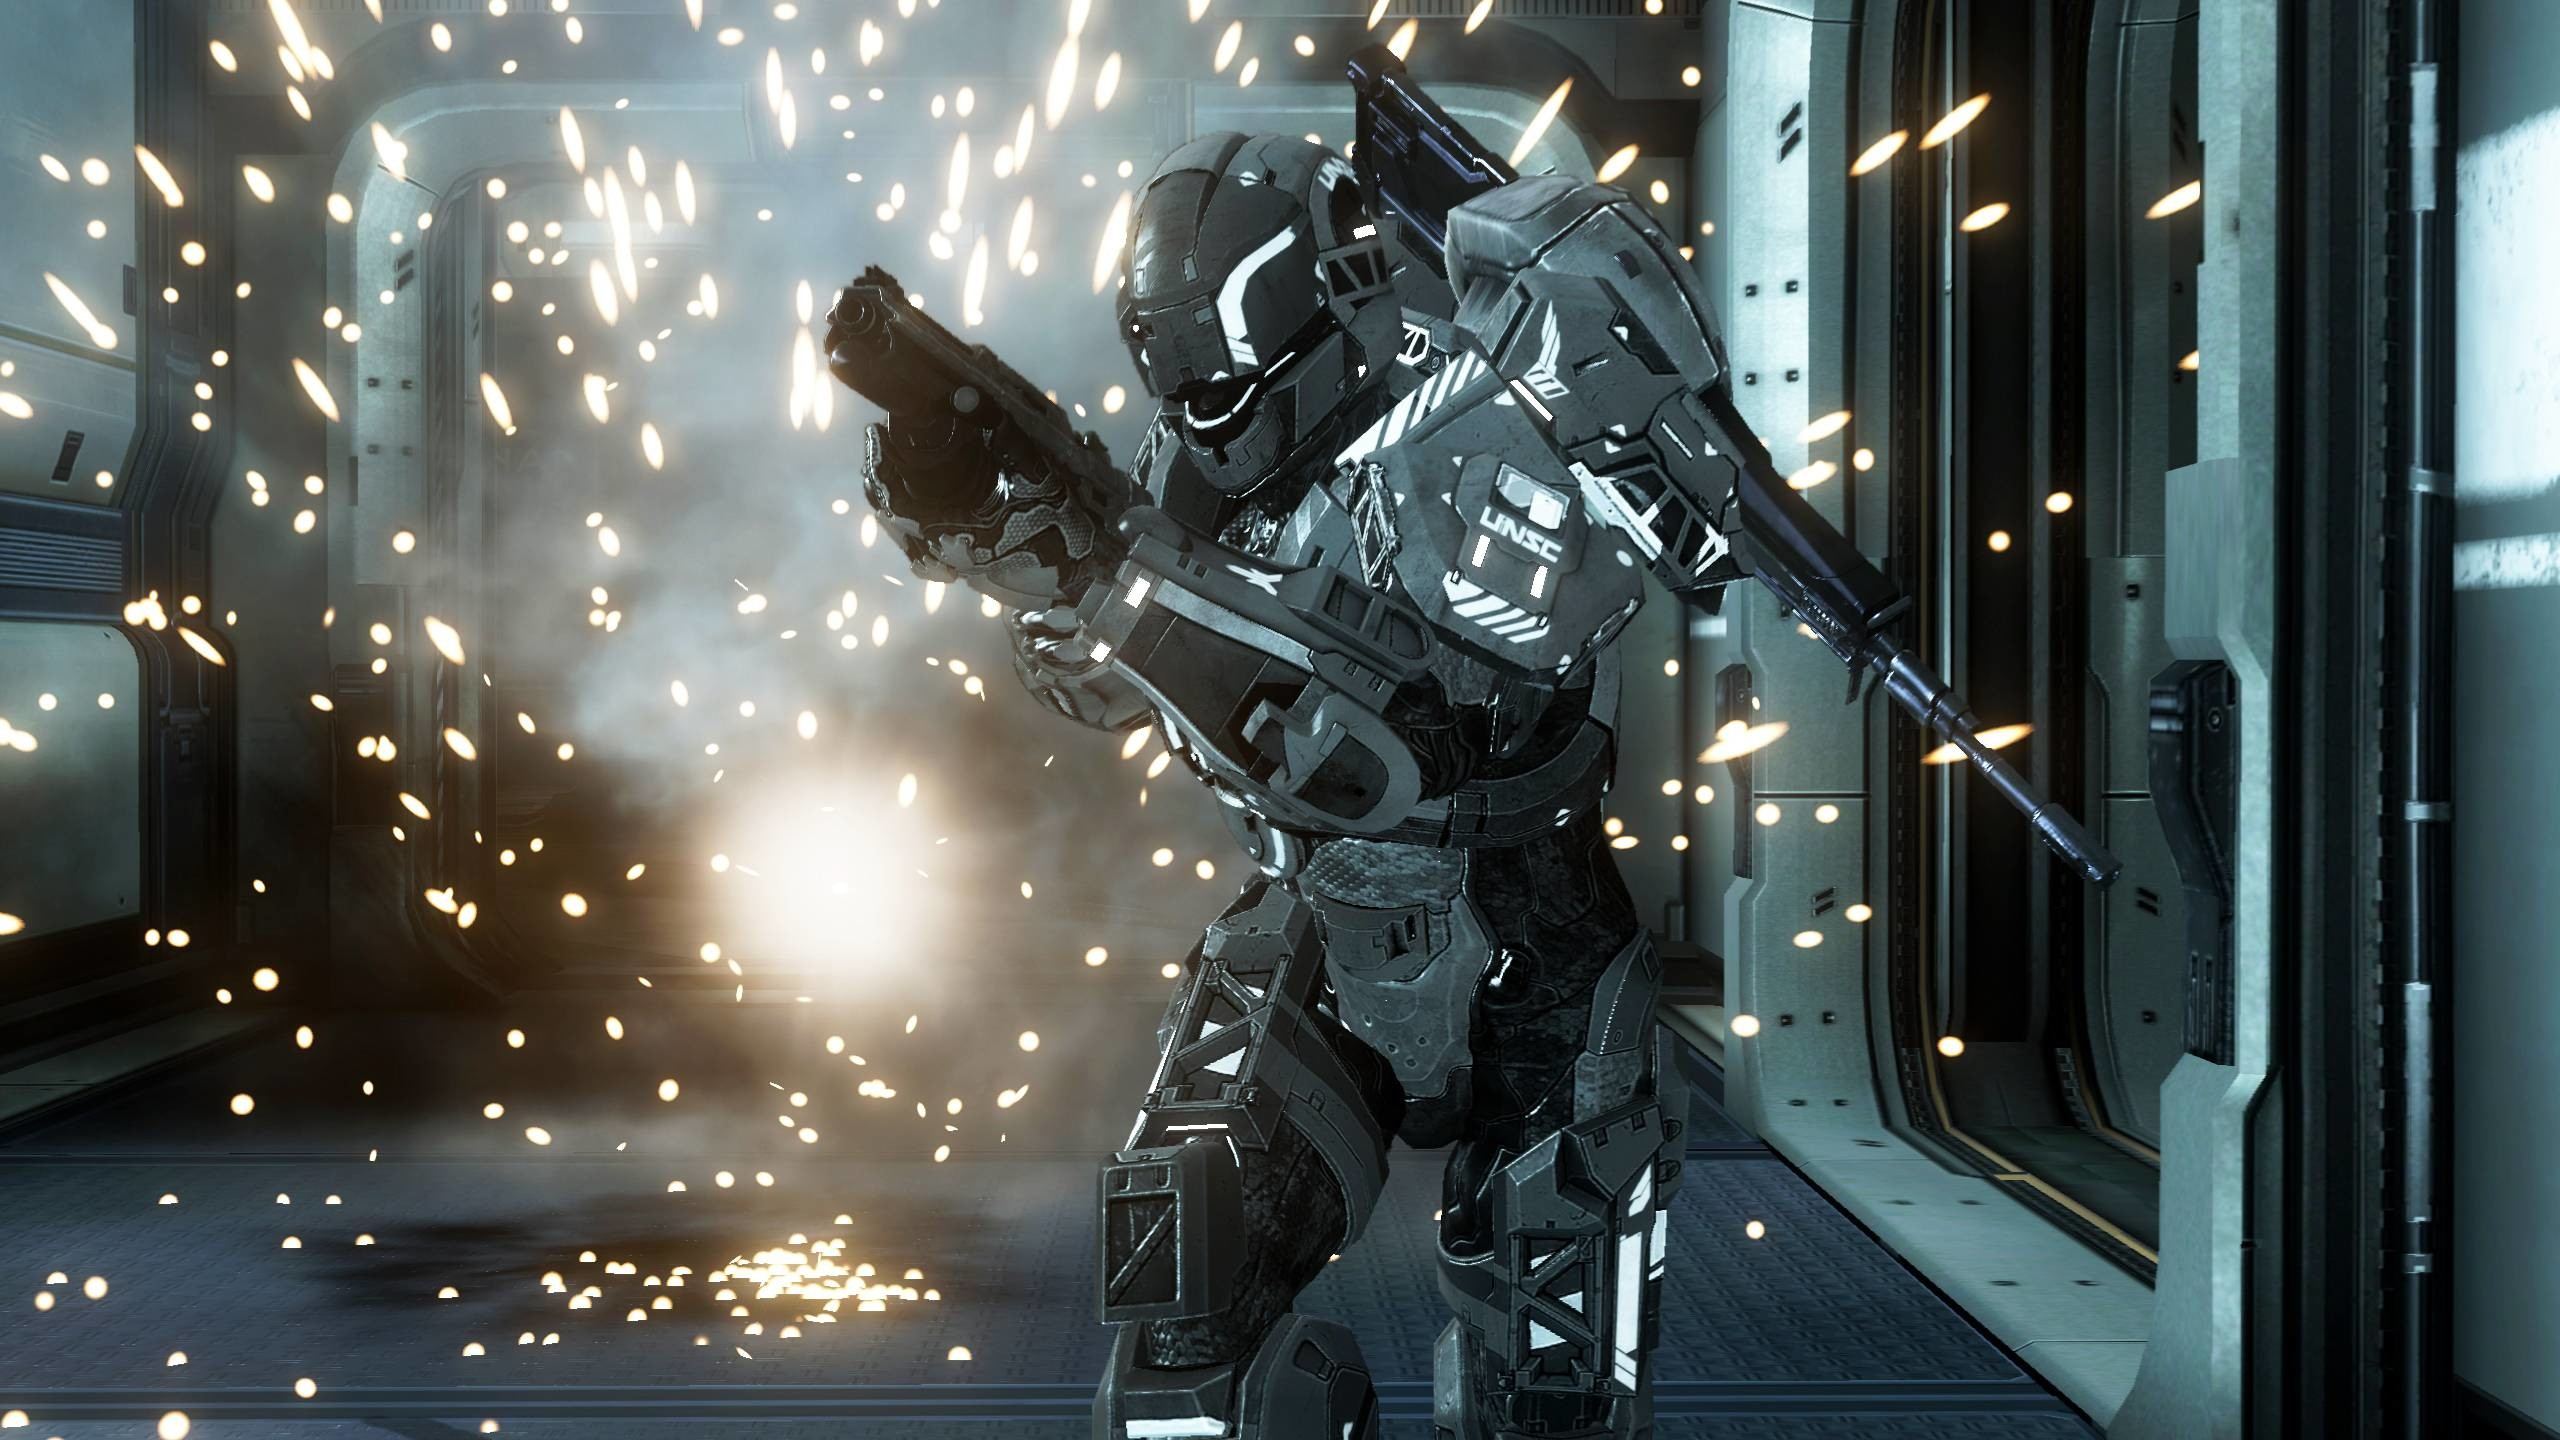 Halo 4 Wallpaper 1080p 75 images 2560x1440